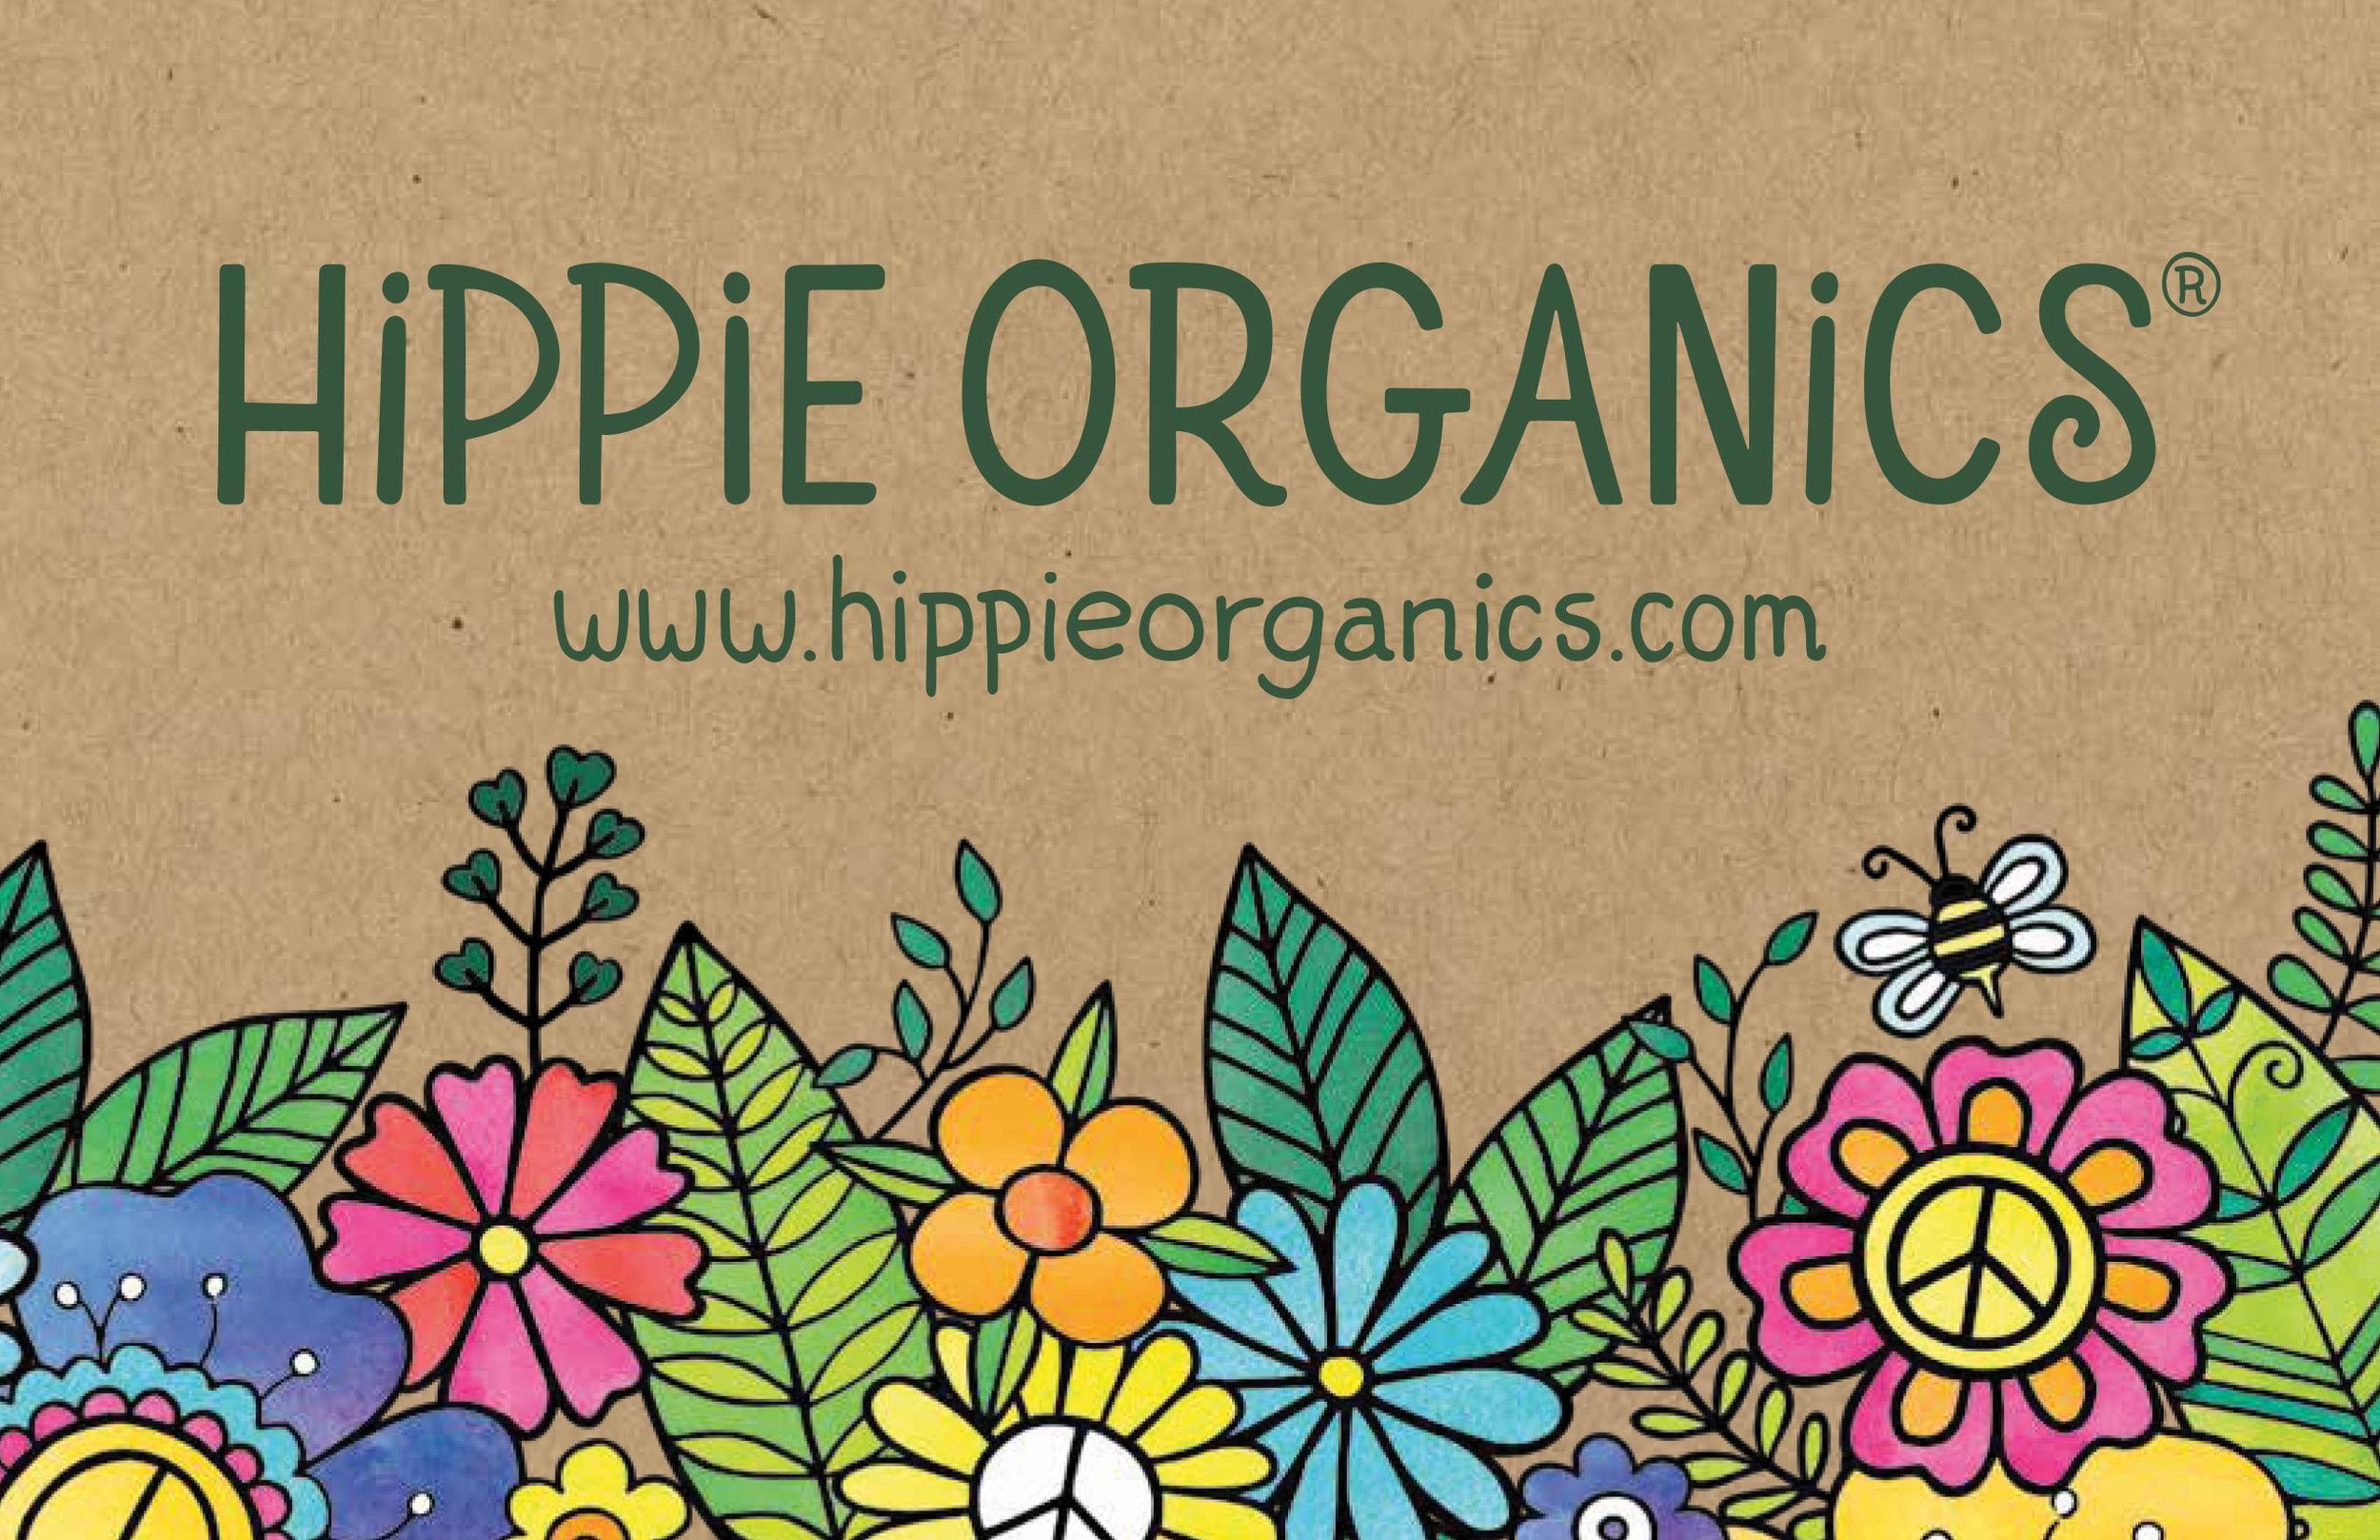 HippieOrganics-OPS18-1.jpg